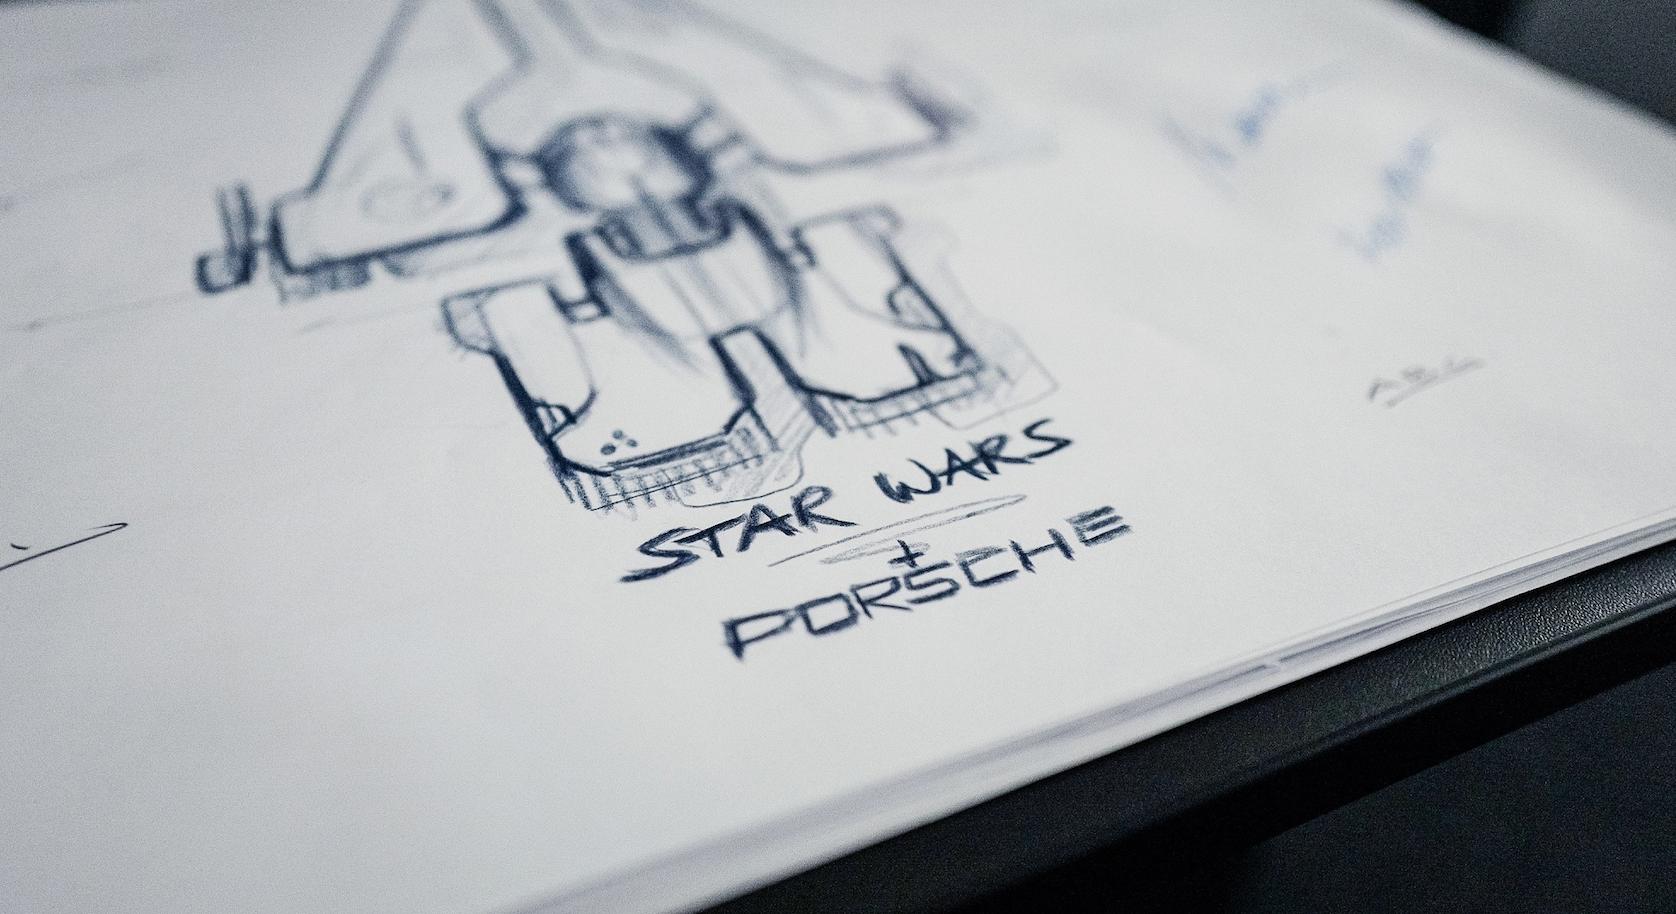 Porsche And Lucasfilm Team Up To Design A New Star Wars Spaceship